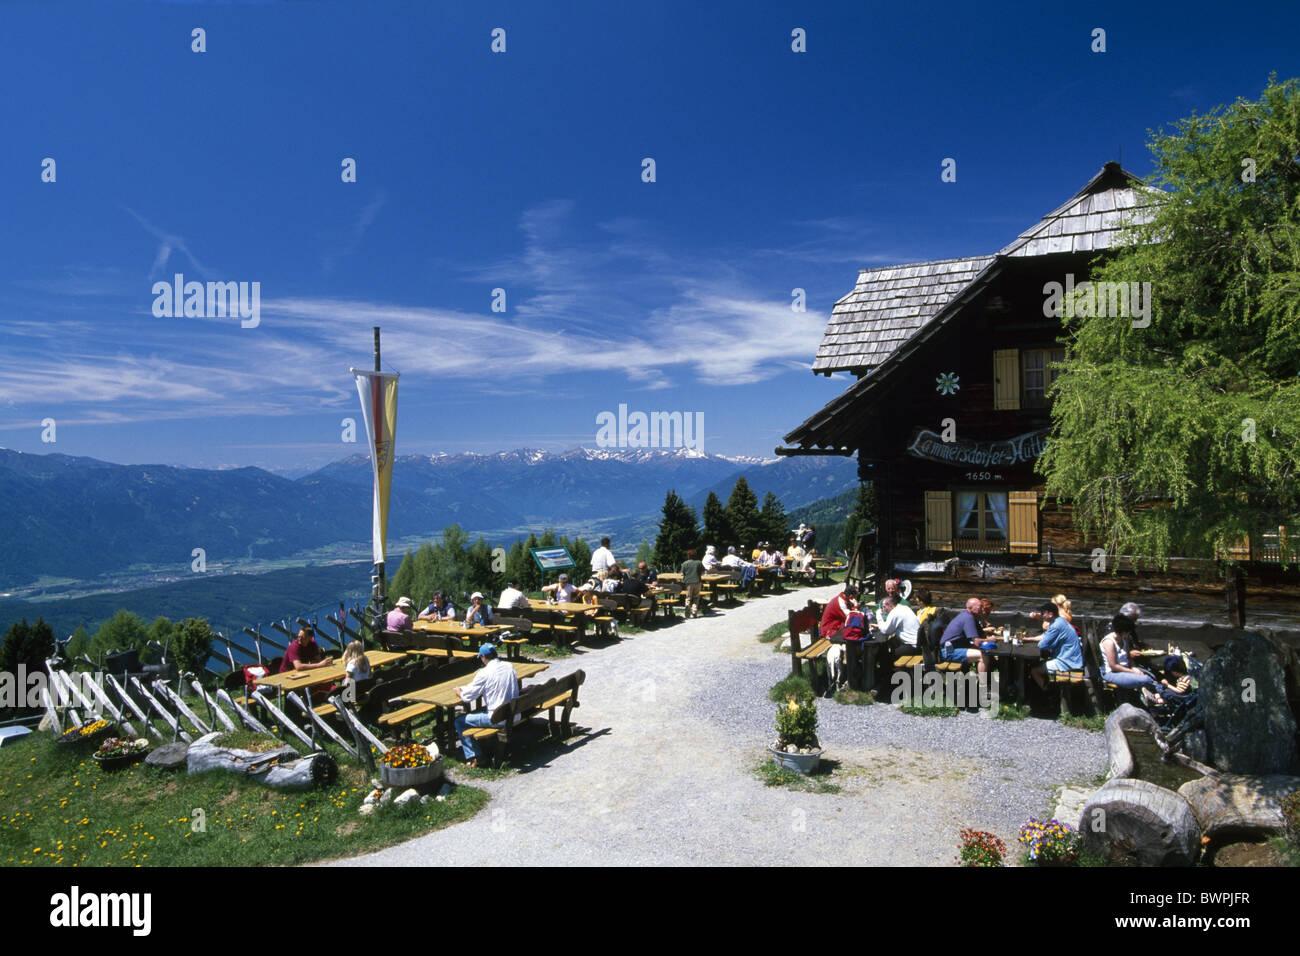 Austria Europe Millstatt Lammersdorfer Hutte Milstatter See Karnten alps State of Carintiha Europe Hutte Obe - Stock Image